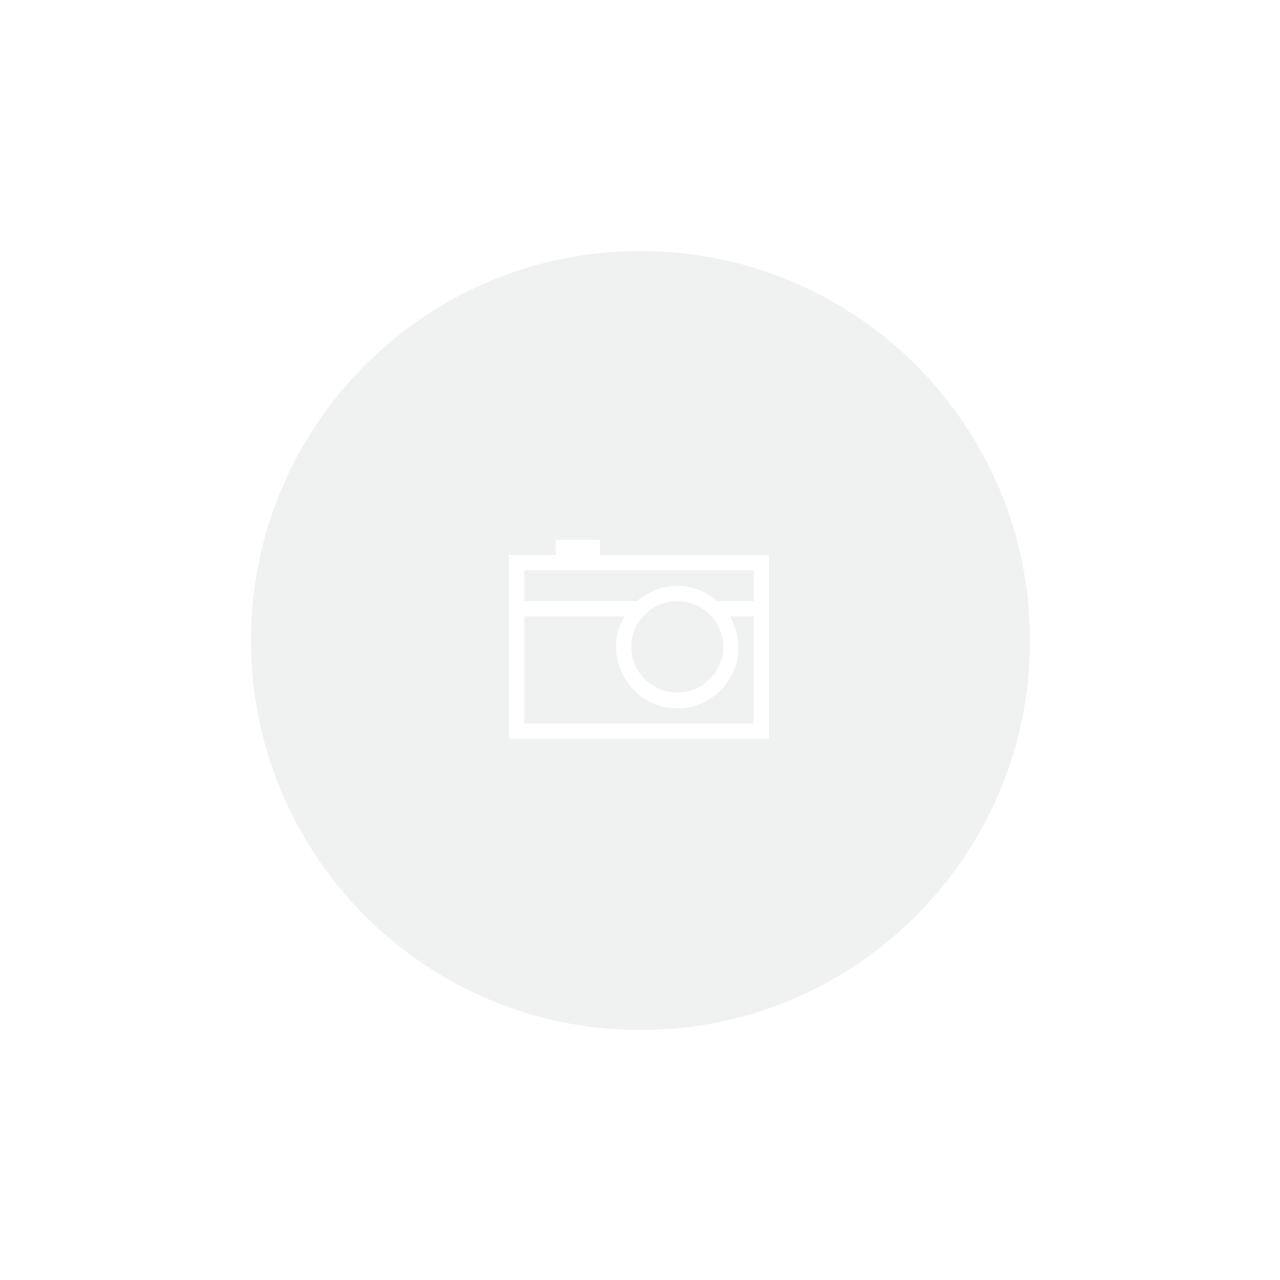 Papel Artesanal Indiano - Ref. 15